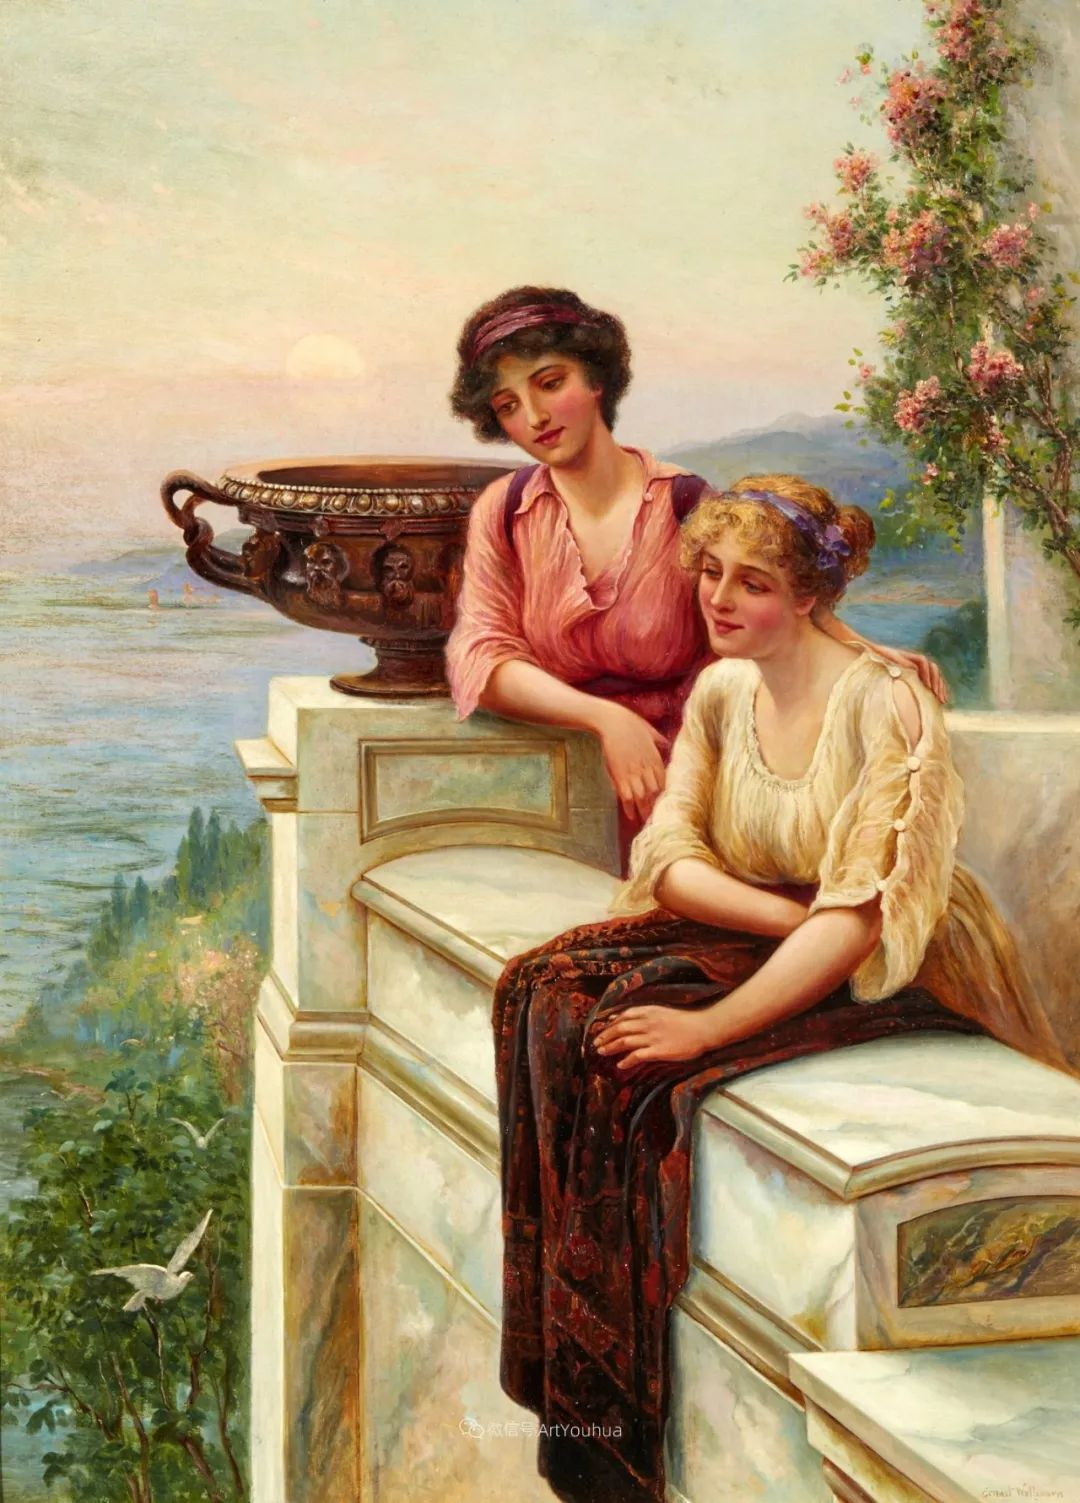 美丽村姑与诗意田园,英国画家Ernest Charles Walbourn作品(下)插图7